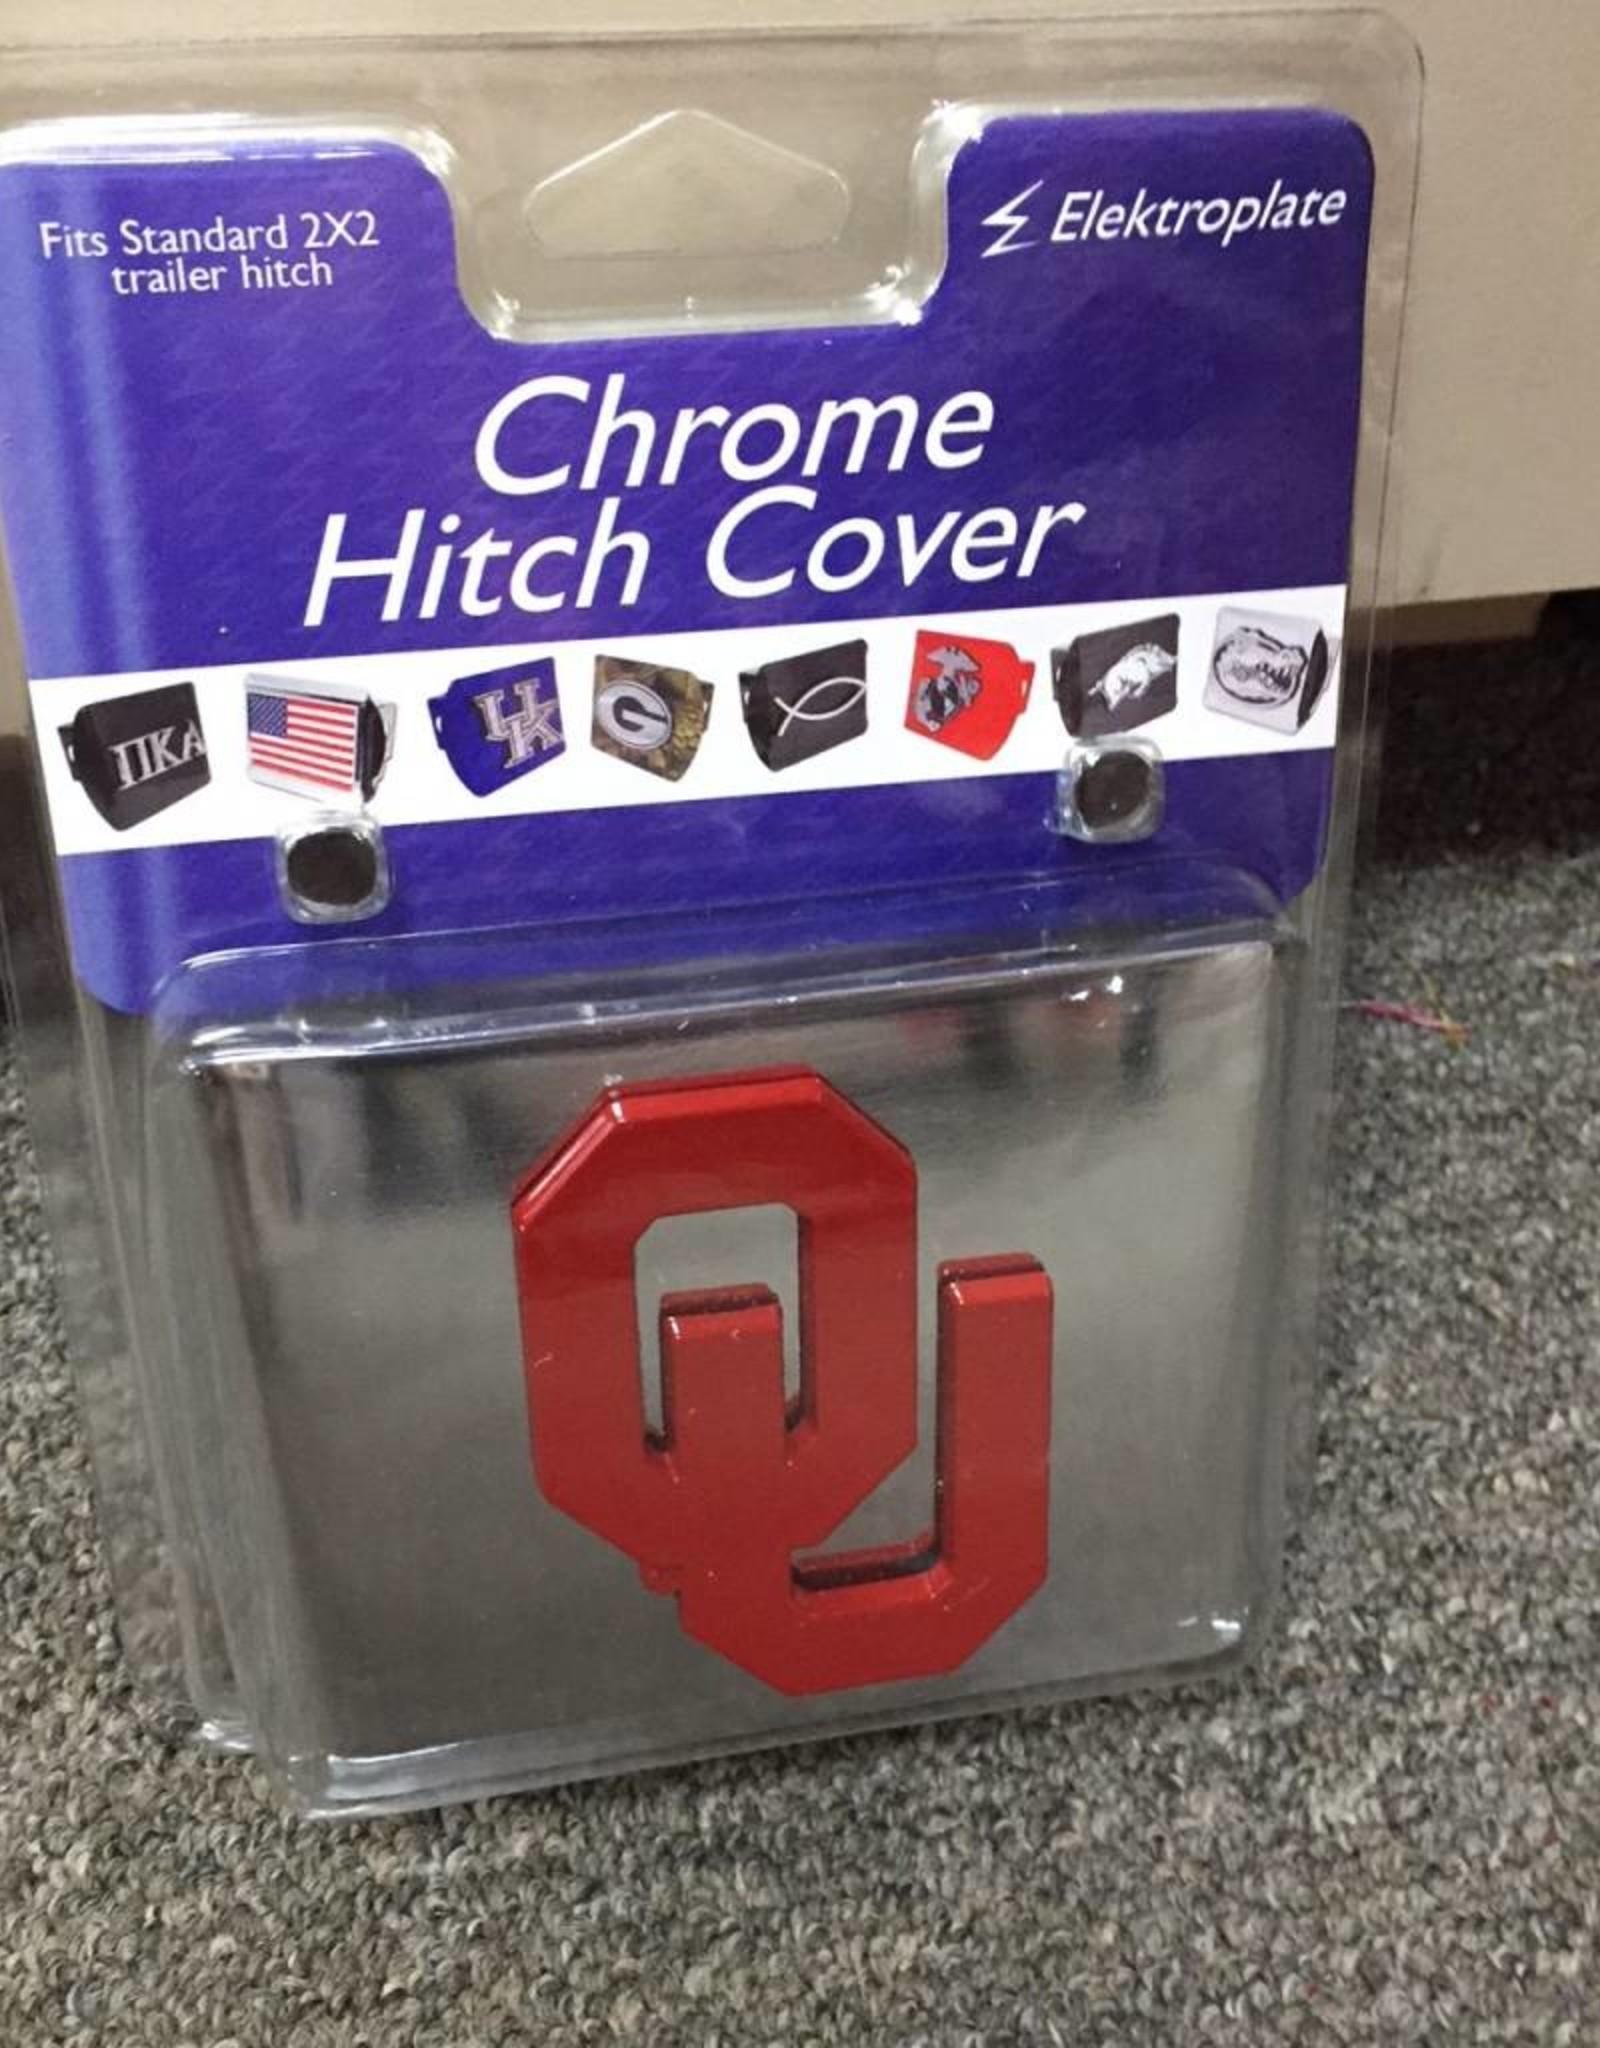 Elektroplate OU Hitch Cover Chrome with Crimson OU